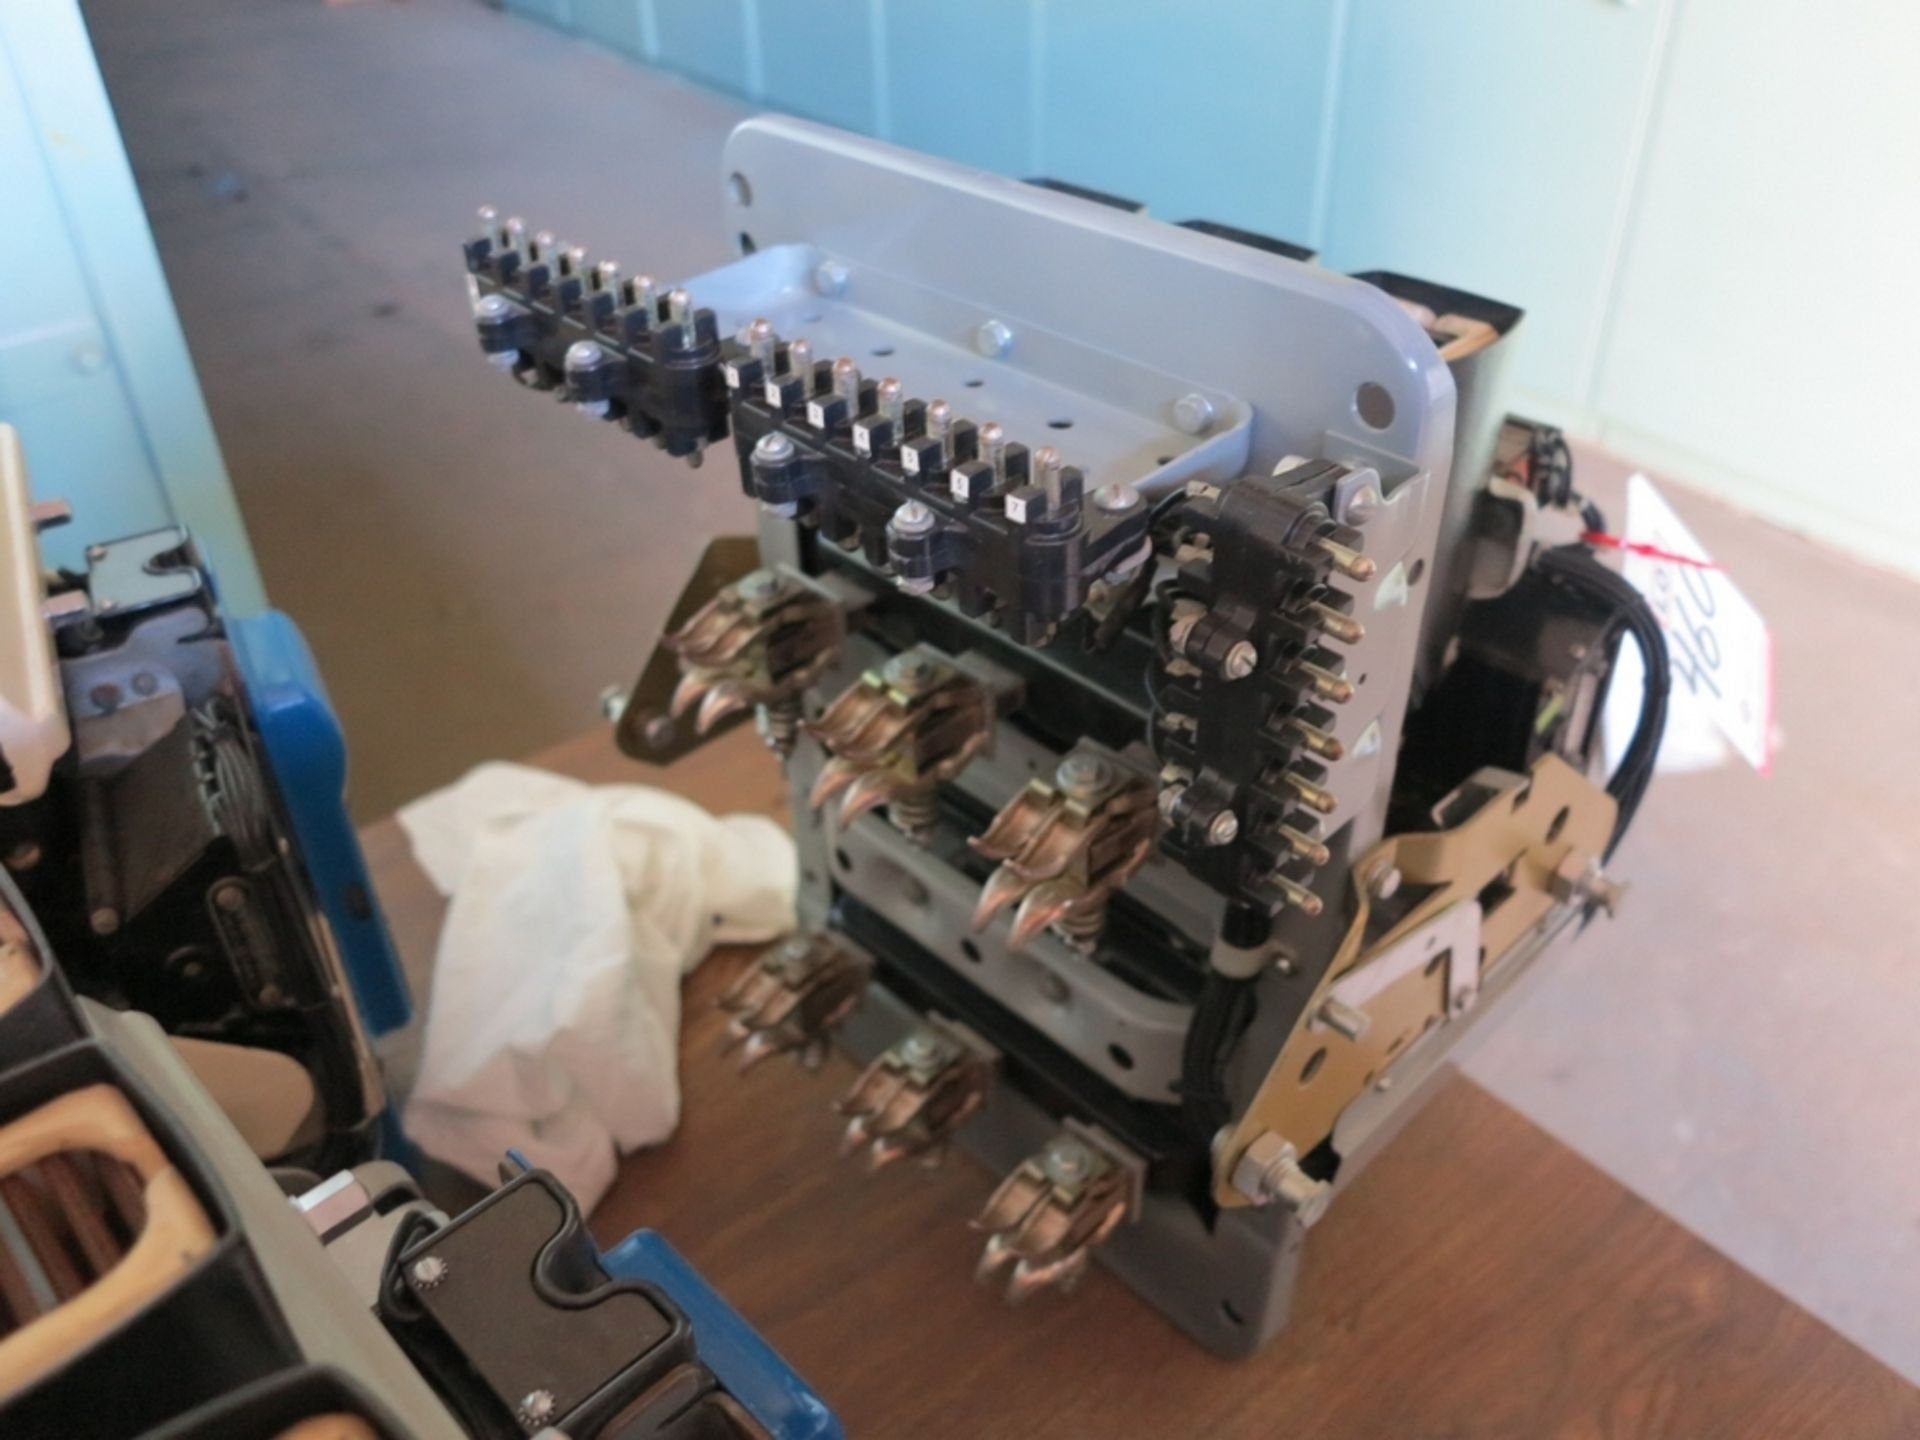 Lot 460 - GE LOW VOLTAGE CIRCUIT BREAKER, 600 V, TYPE: AK-7A-25-1